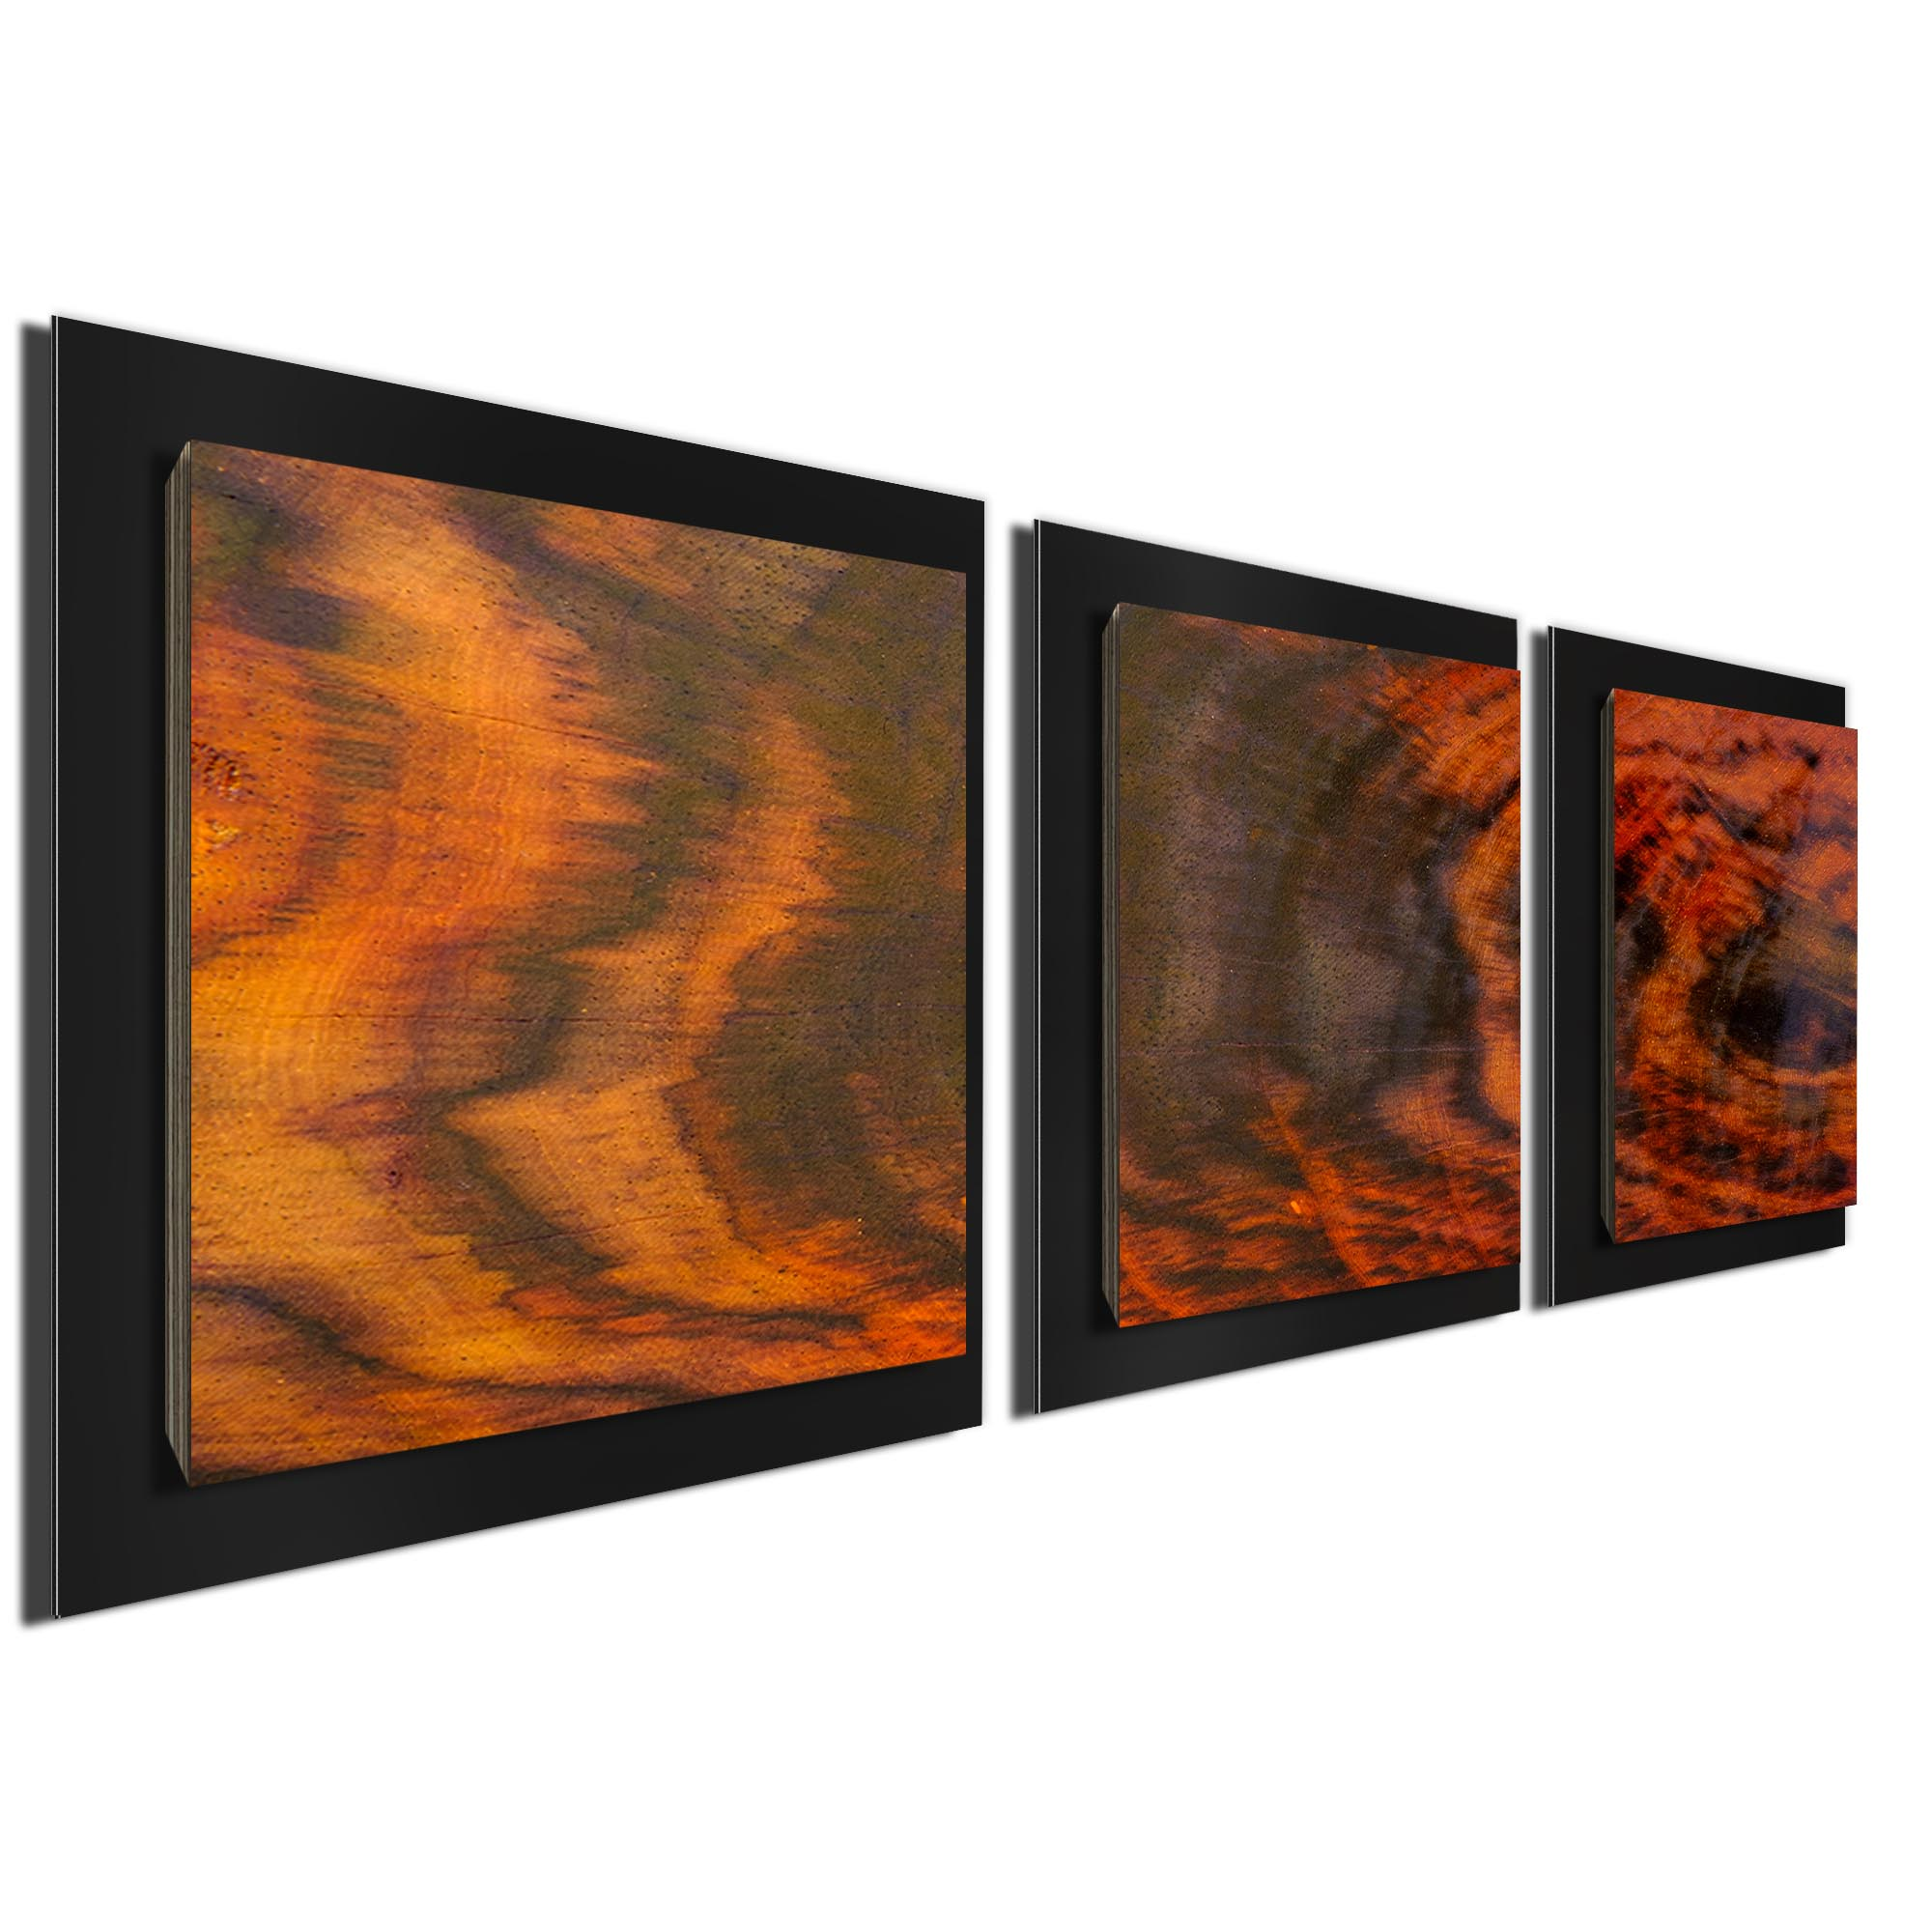 Burnt Wood Essence Black by Adam Schwoeppe Rustic Modern Style Wood Wall Art - Image 2